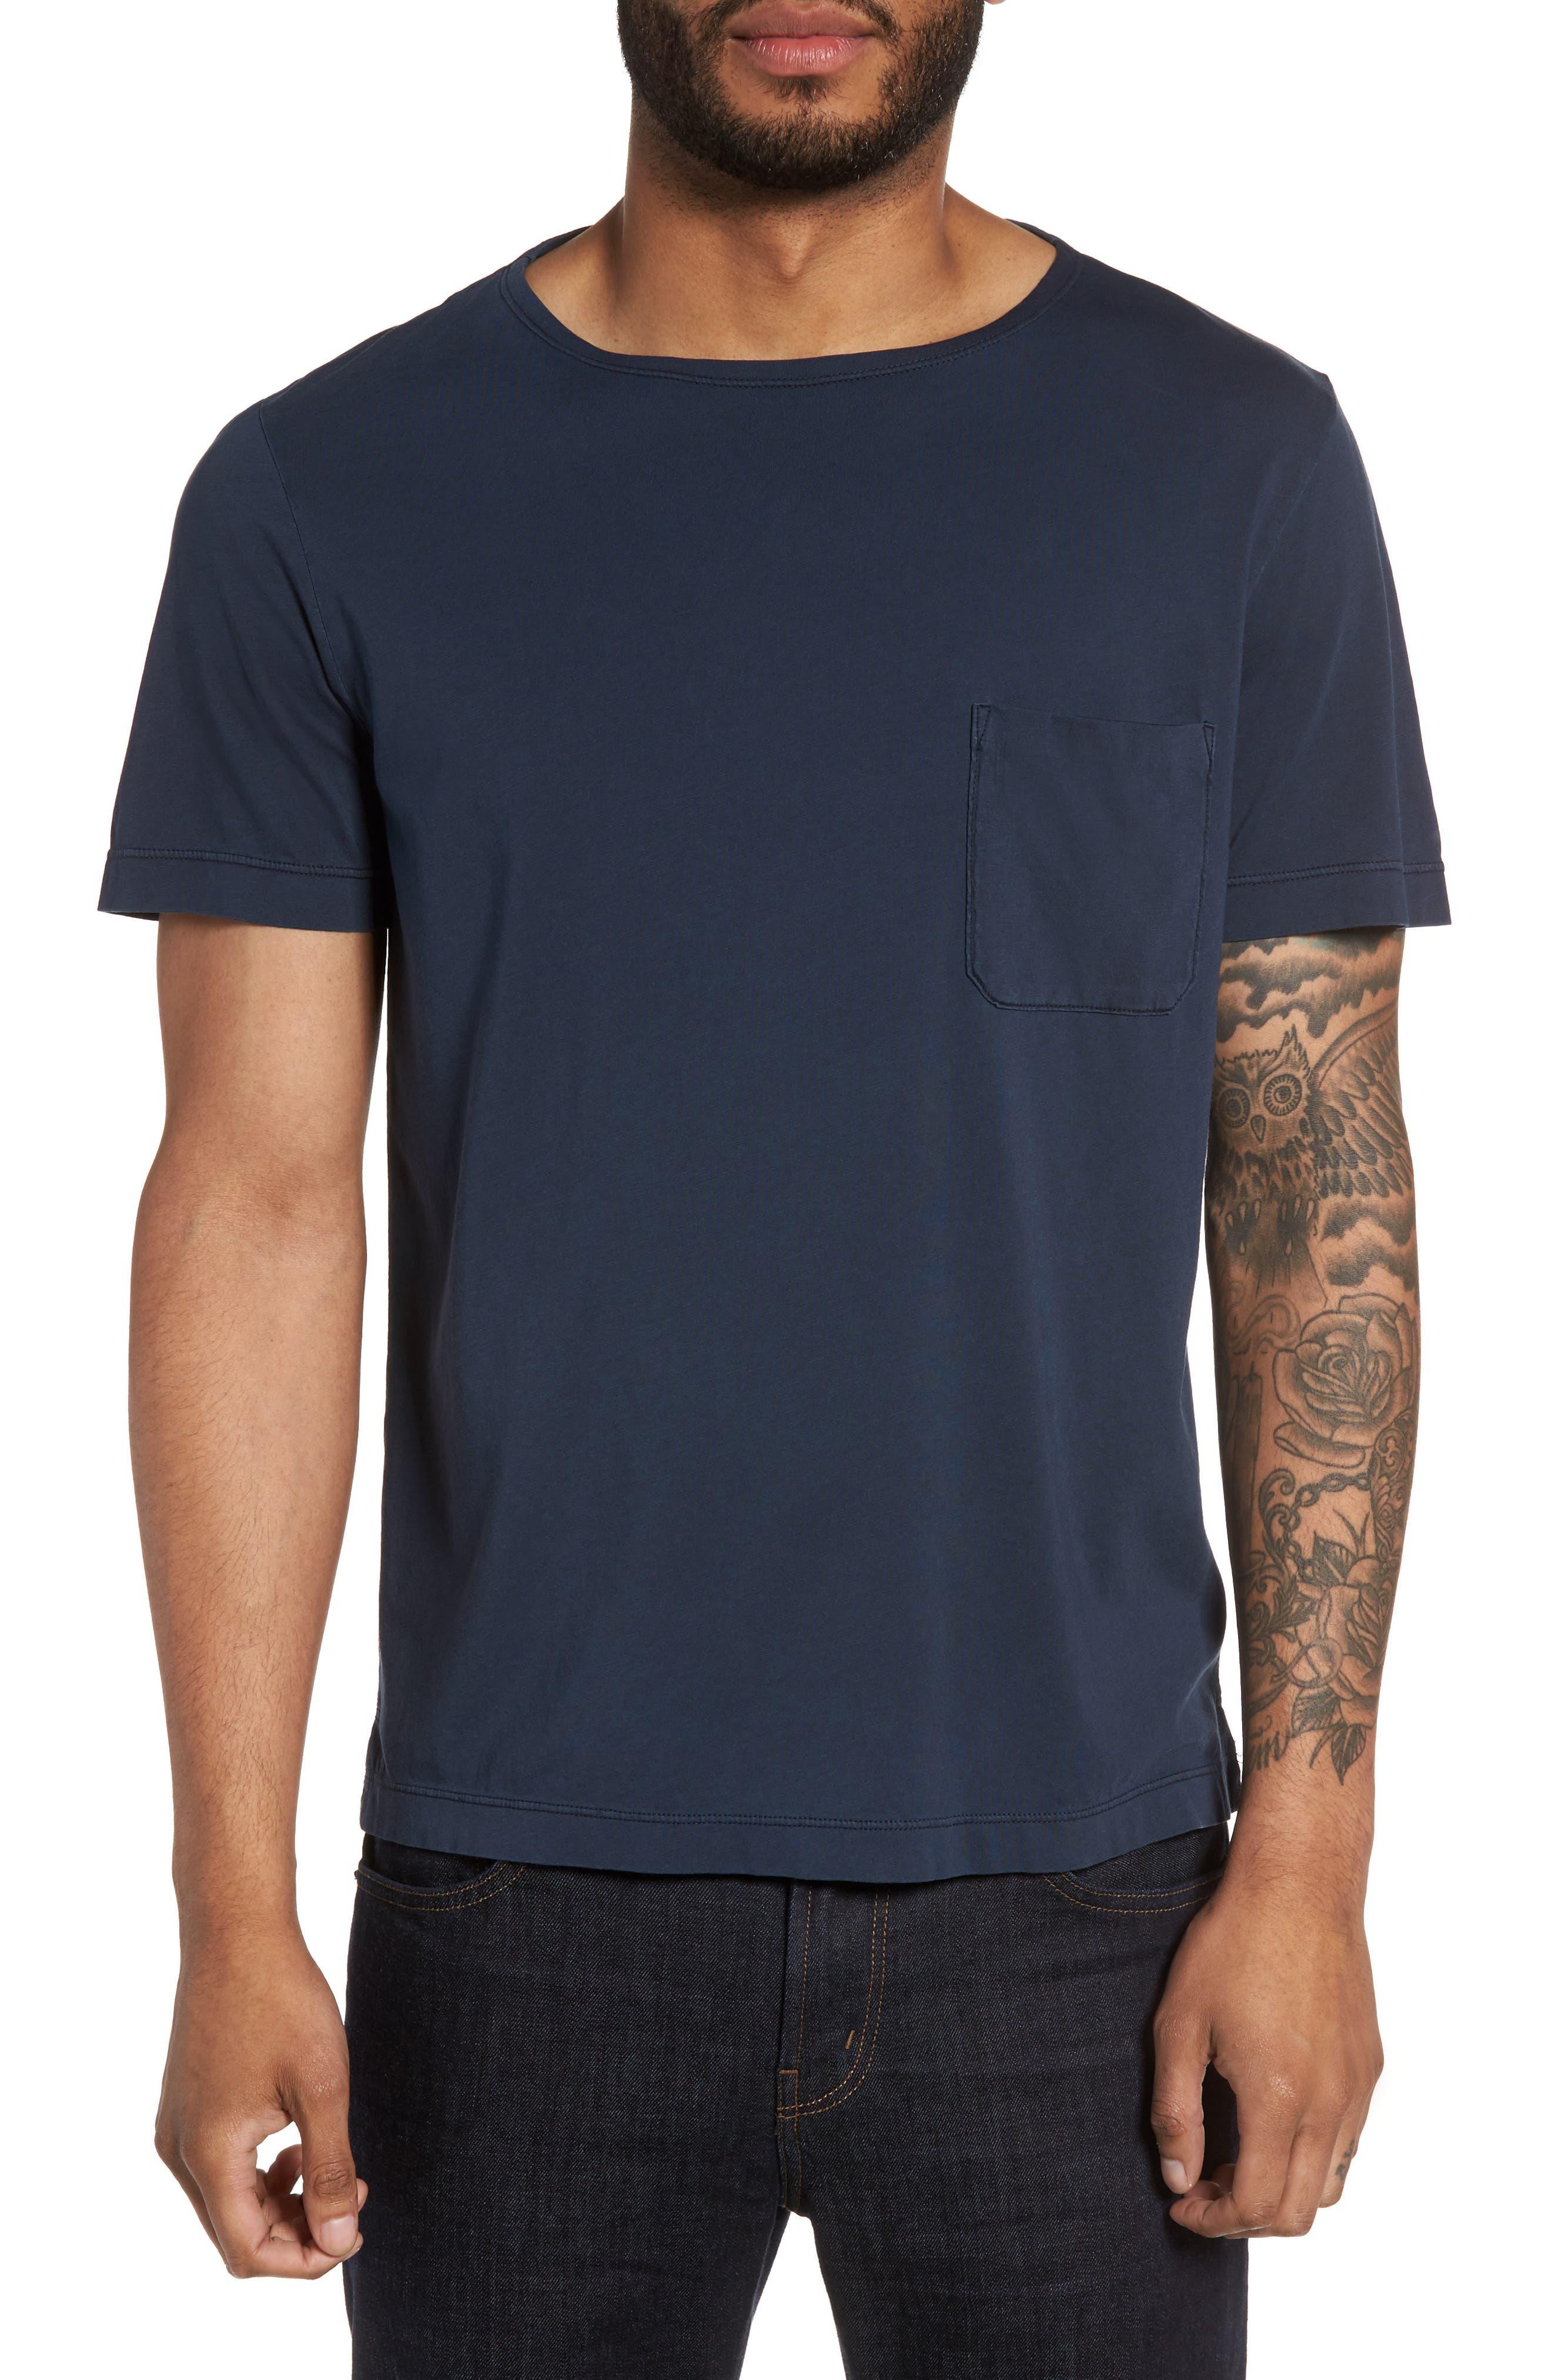 Theory Boatneck Pocket T-Shirt